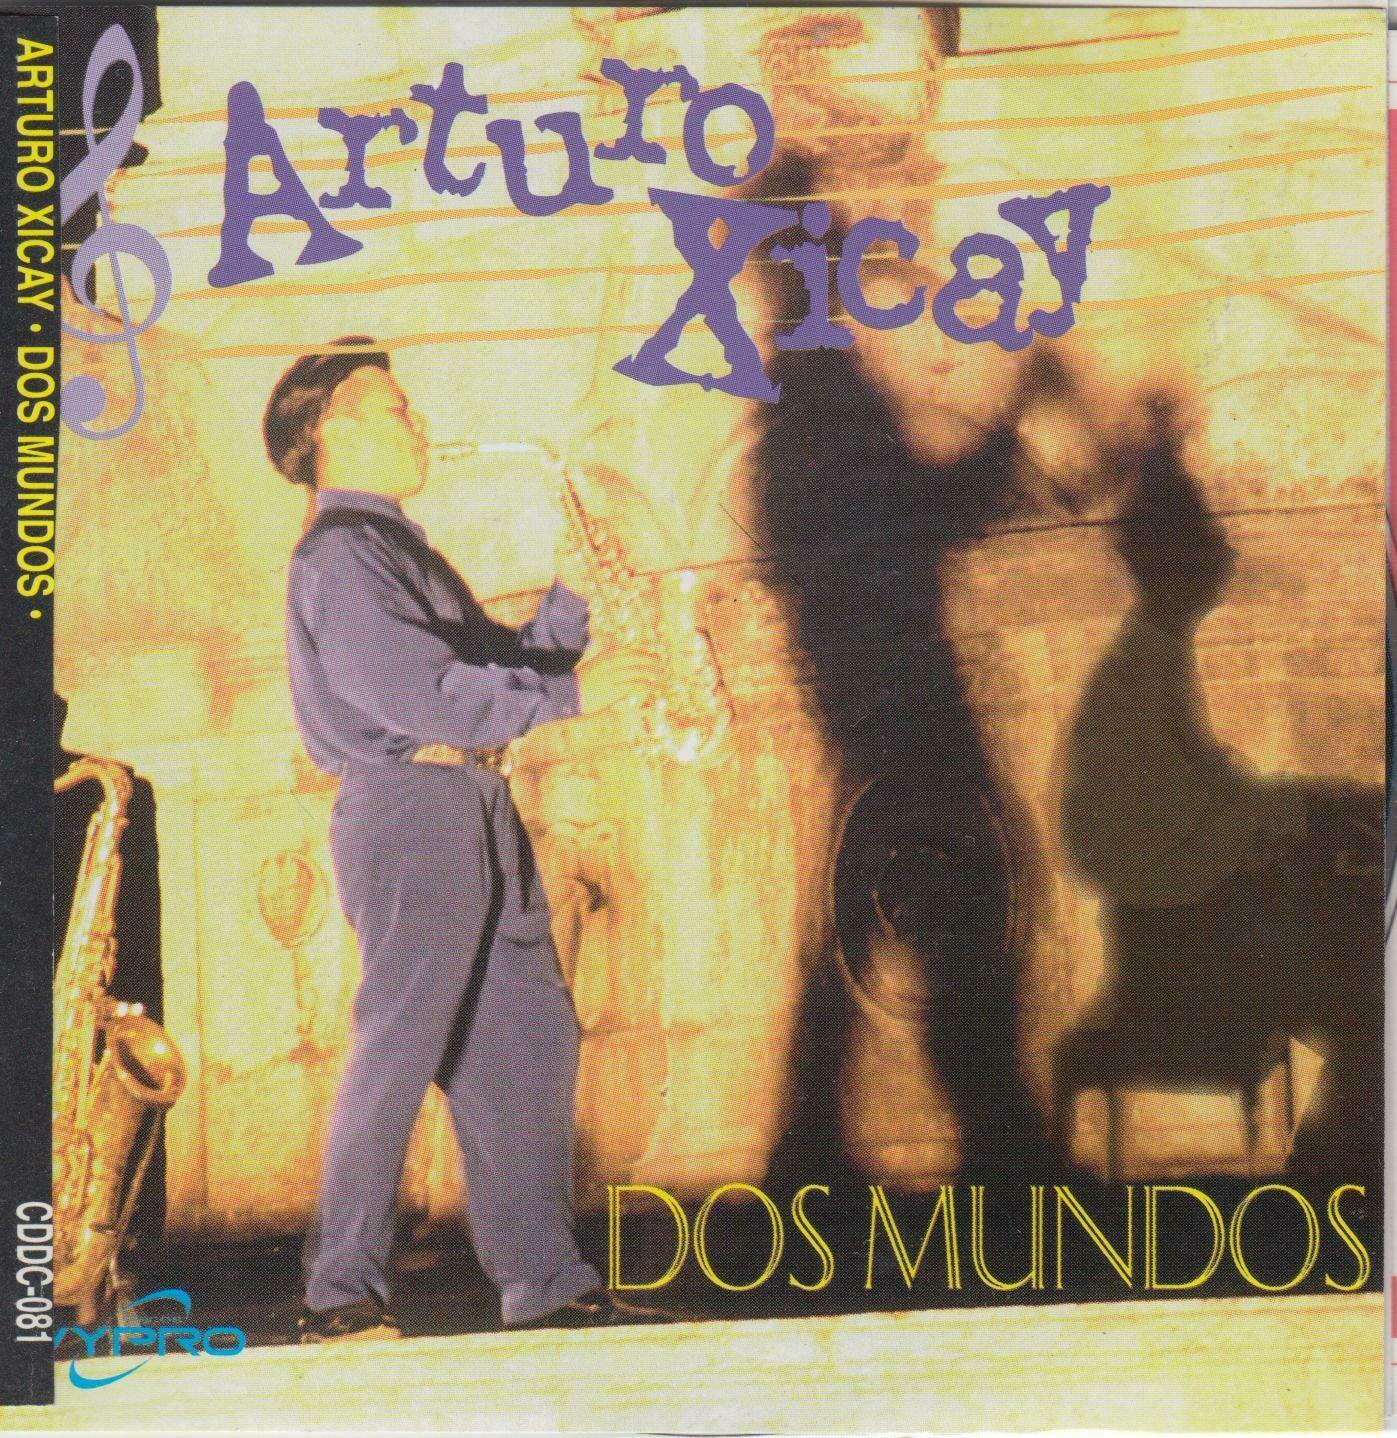 CD Arturo Xicay - Dos mundos